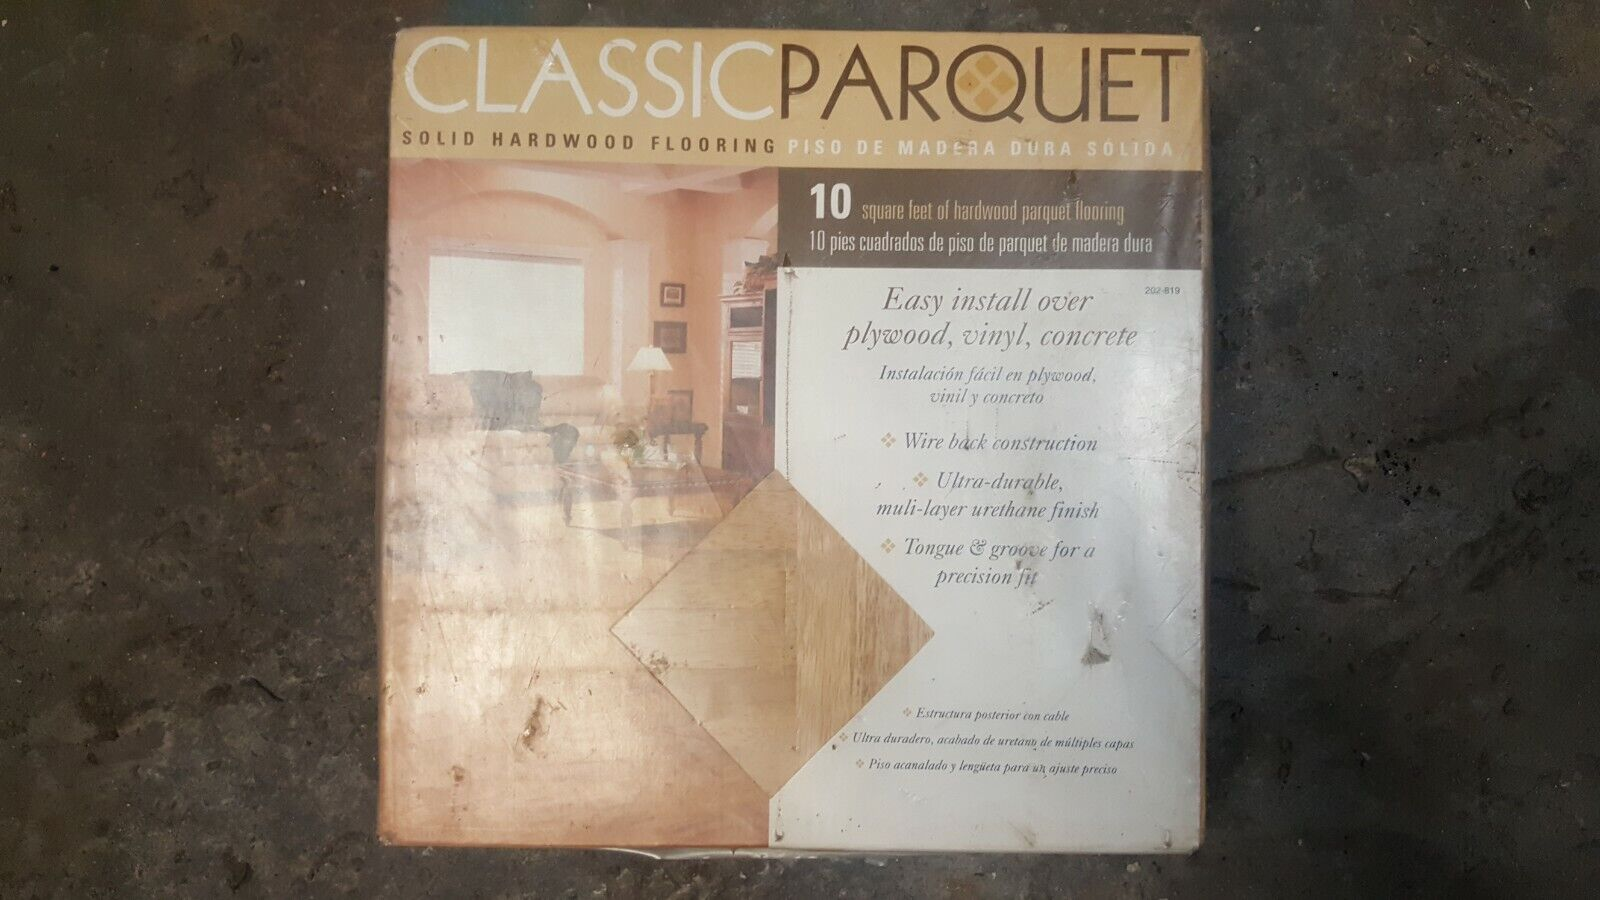 classic parquet one box 10 sq ft